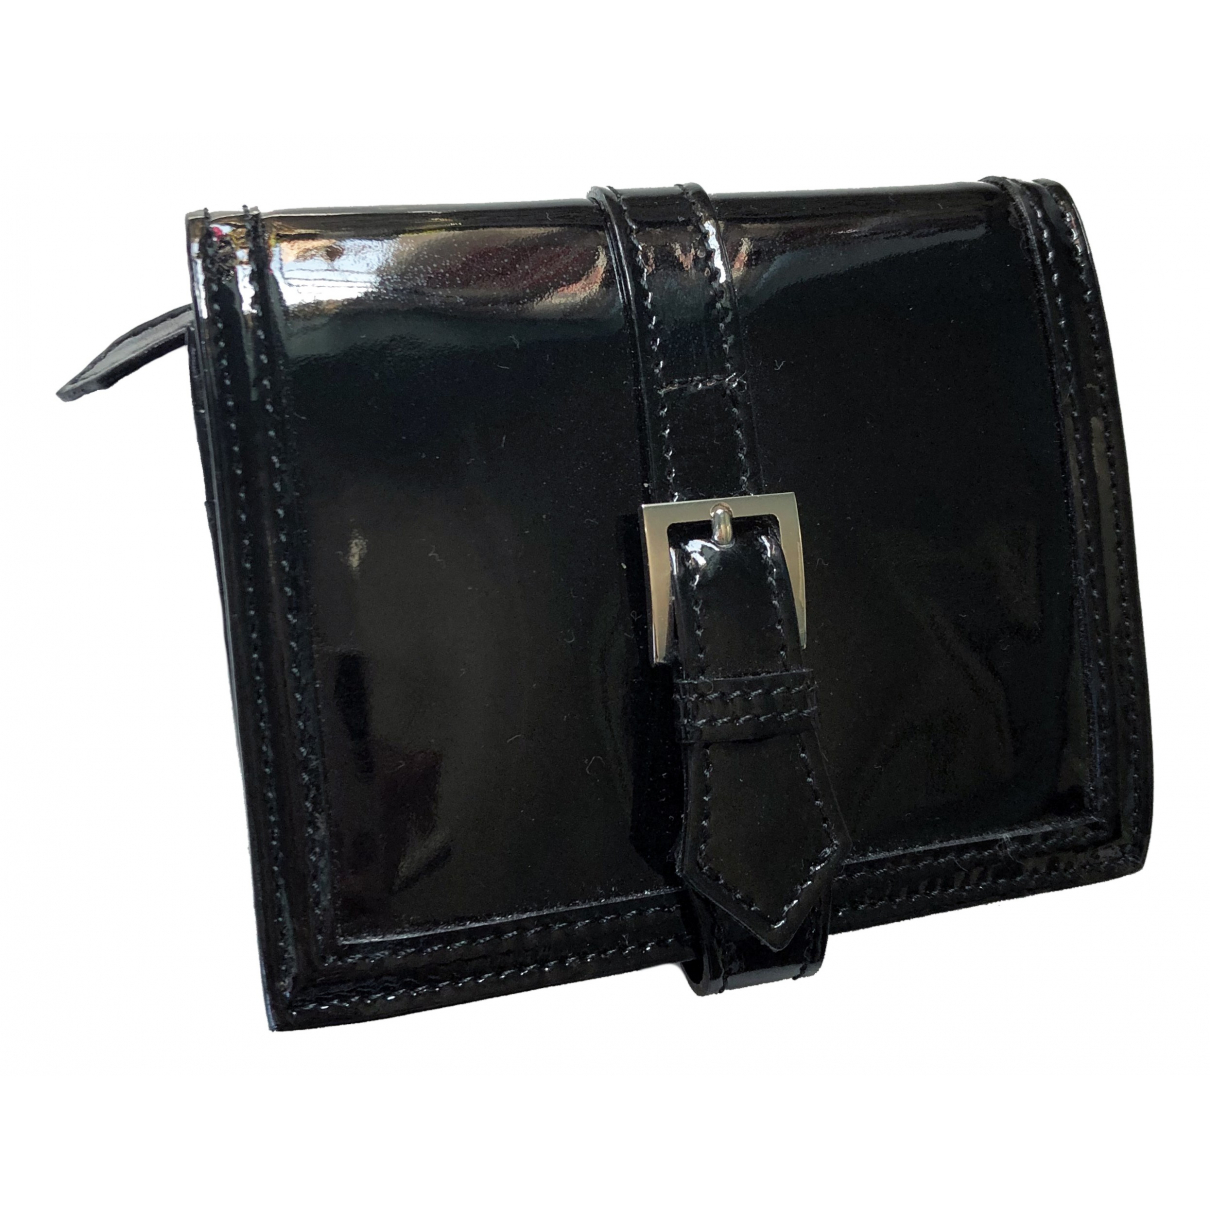 Burberry \N Portemonnaie in  Schwarz Lackleder